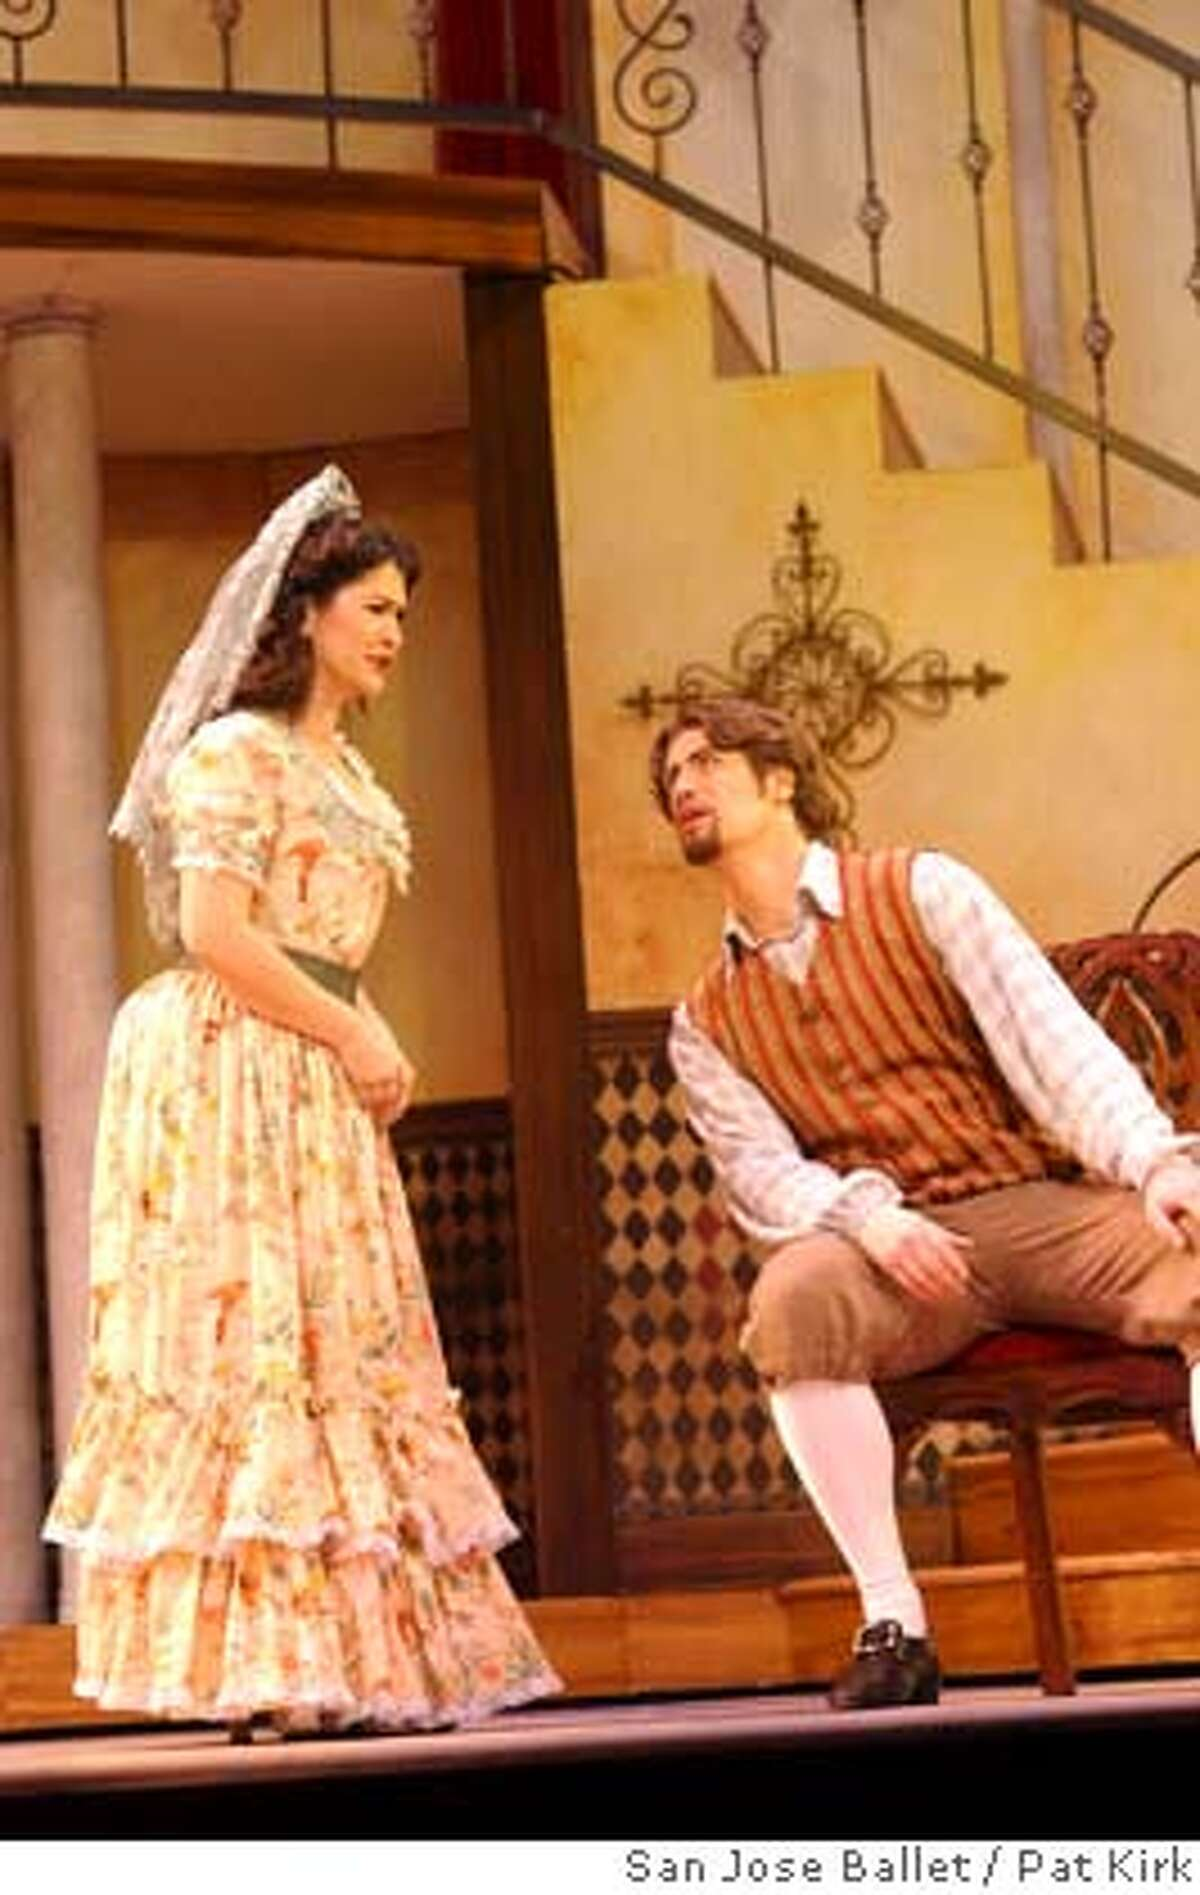 Just like SF Opera, Opera San Jose is doing Rossini's comedy